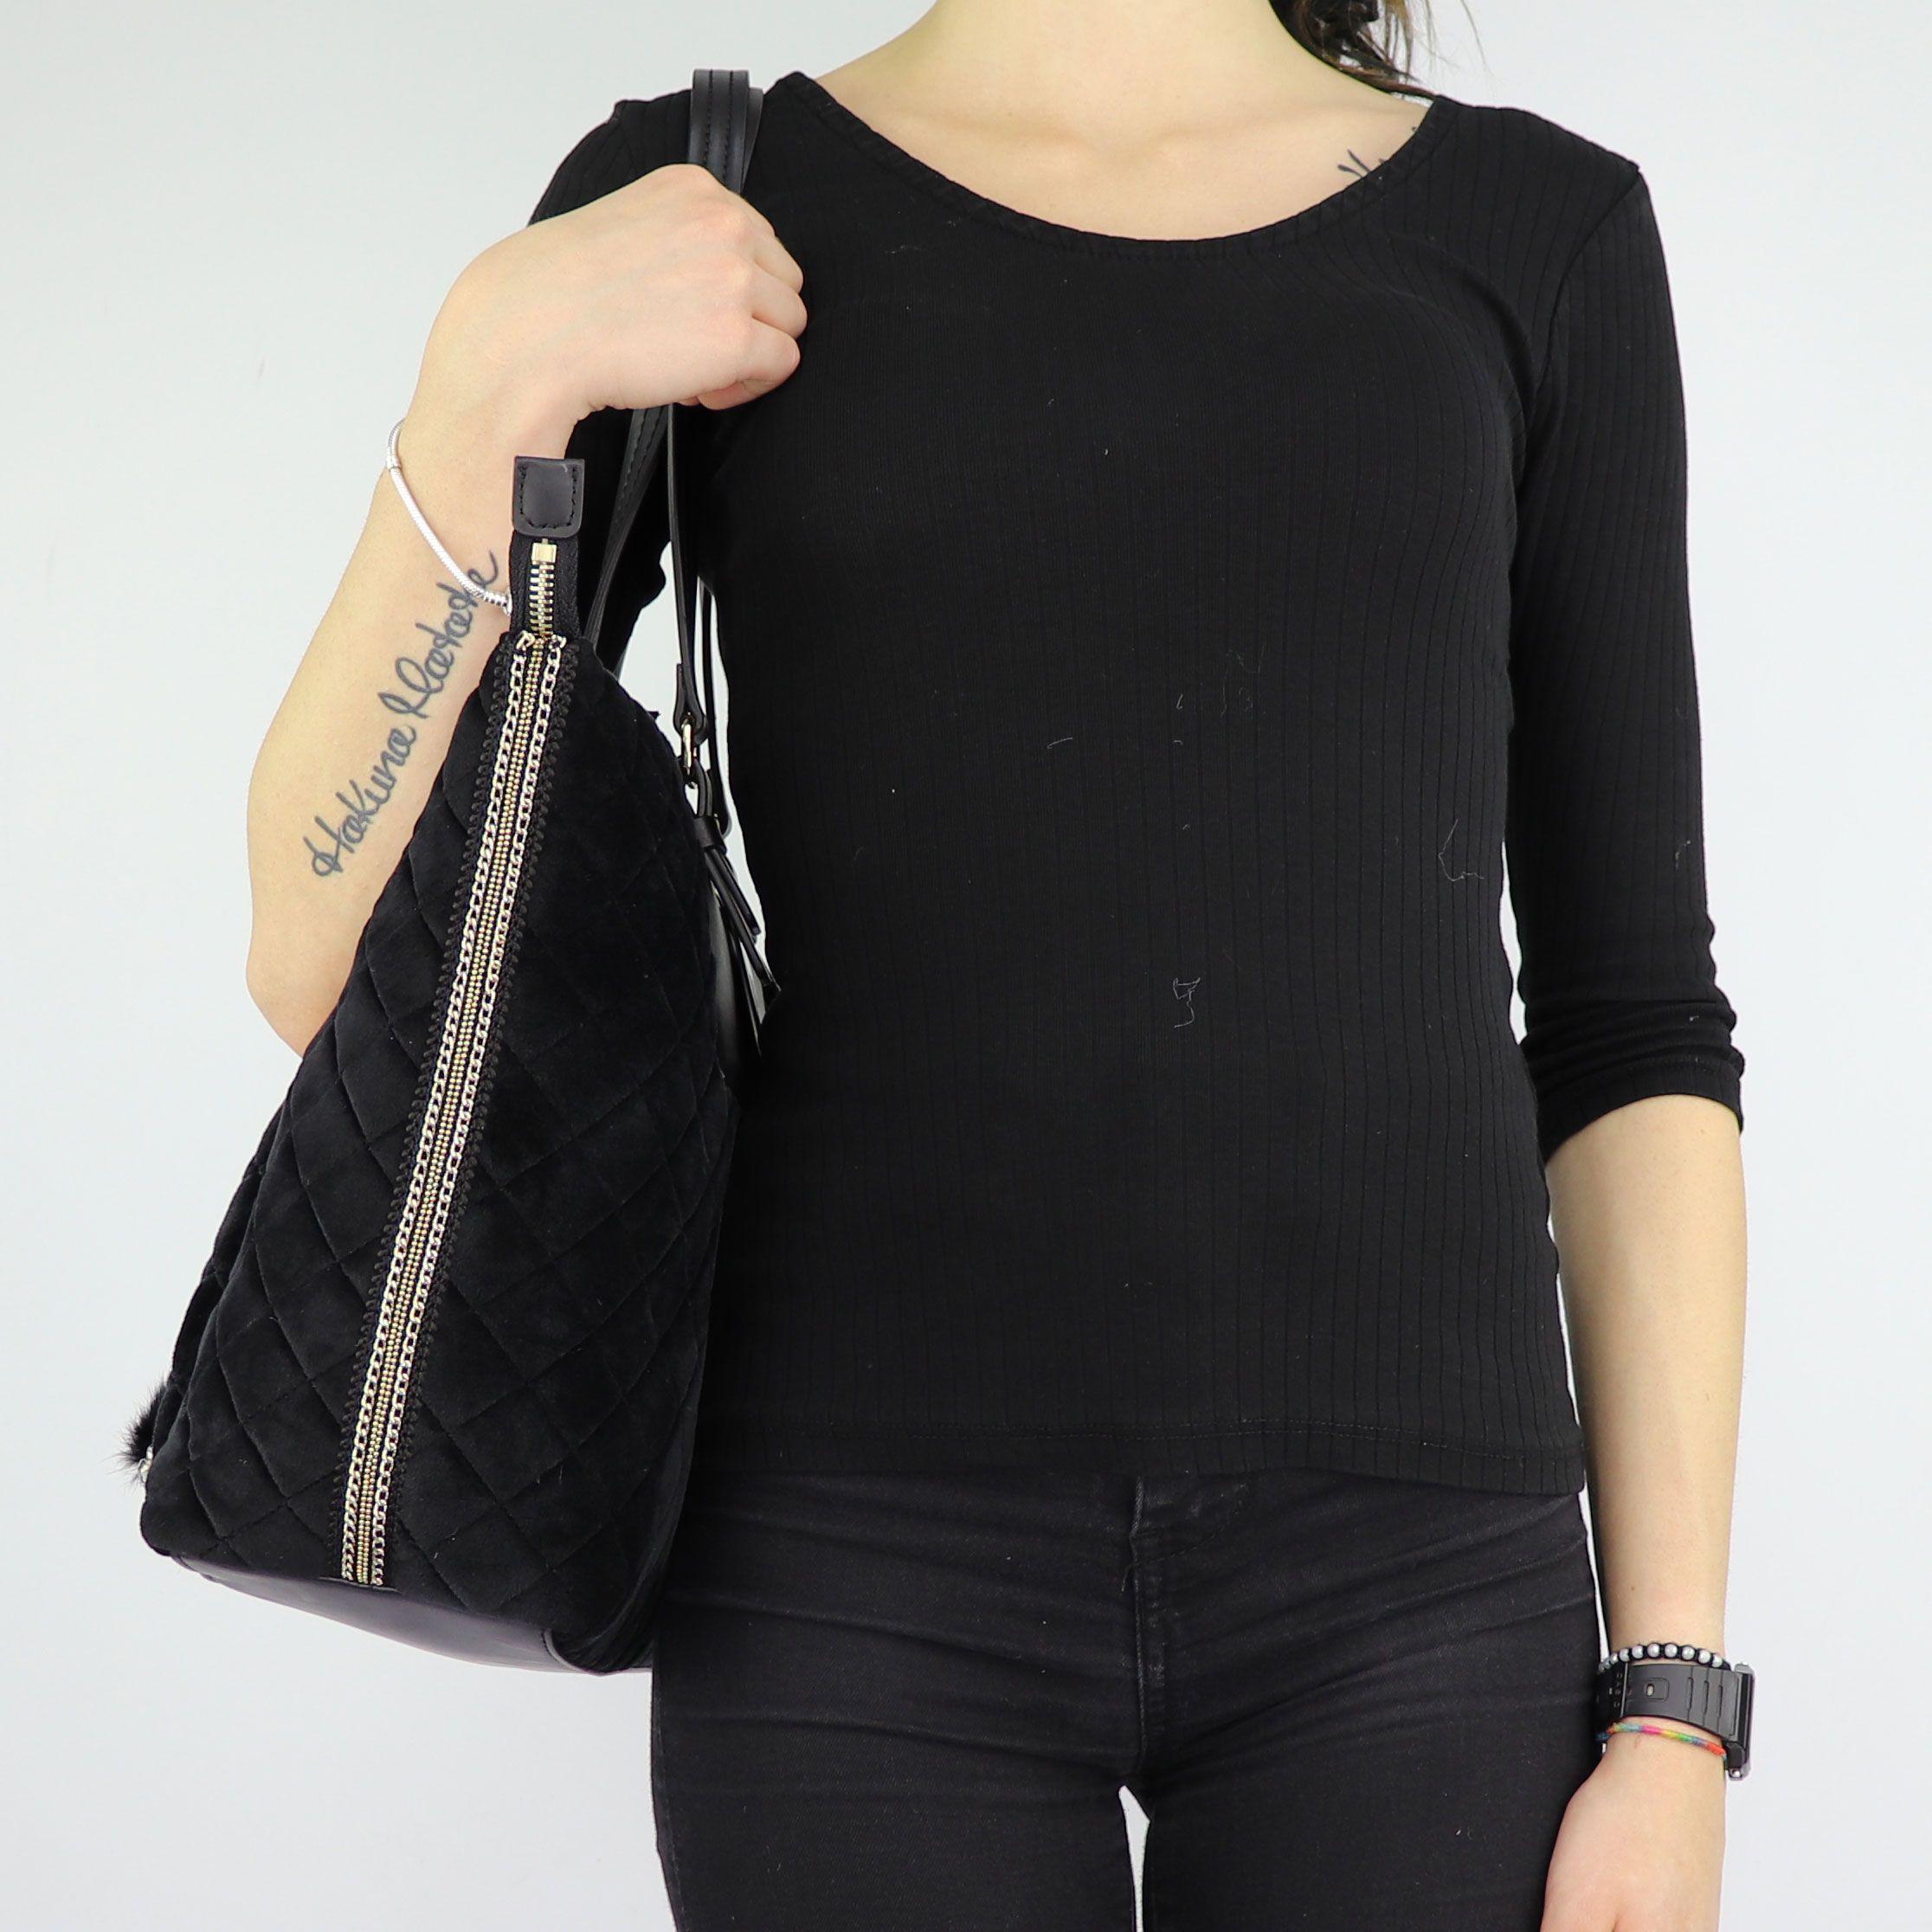 Borsa Liu Jo nera shopping in velluto Tote Brenta N68060 T9093  b357188b832